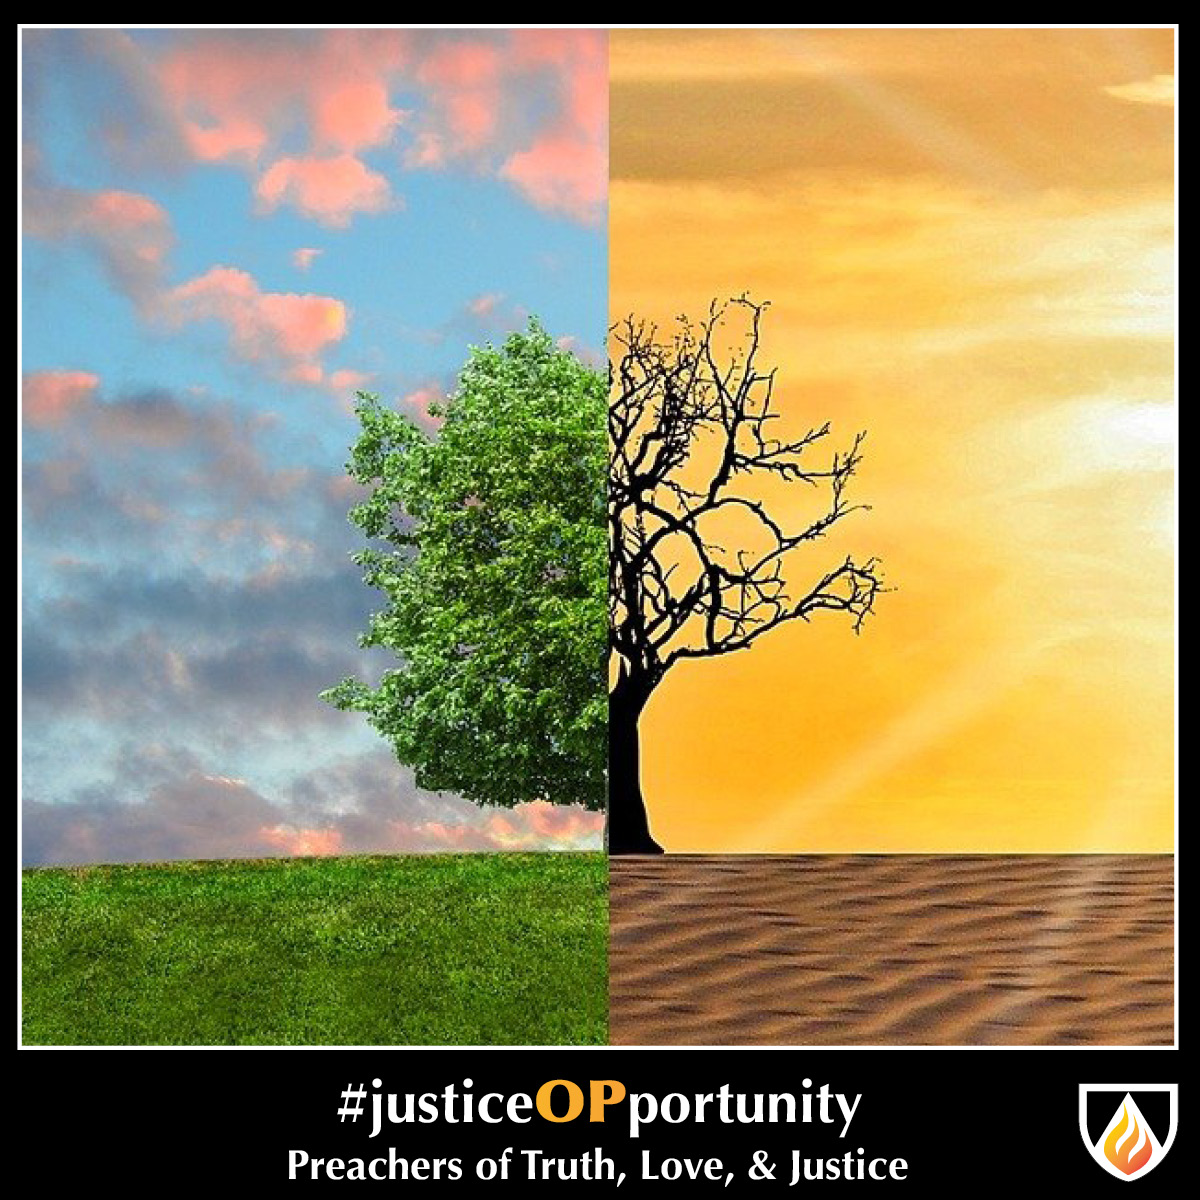 #justiceOPportunity Thursday—September 9, 2021